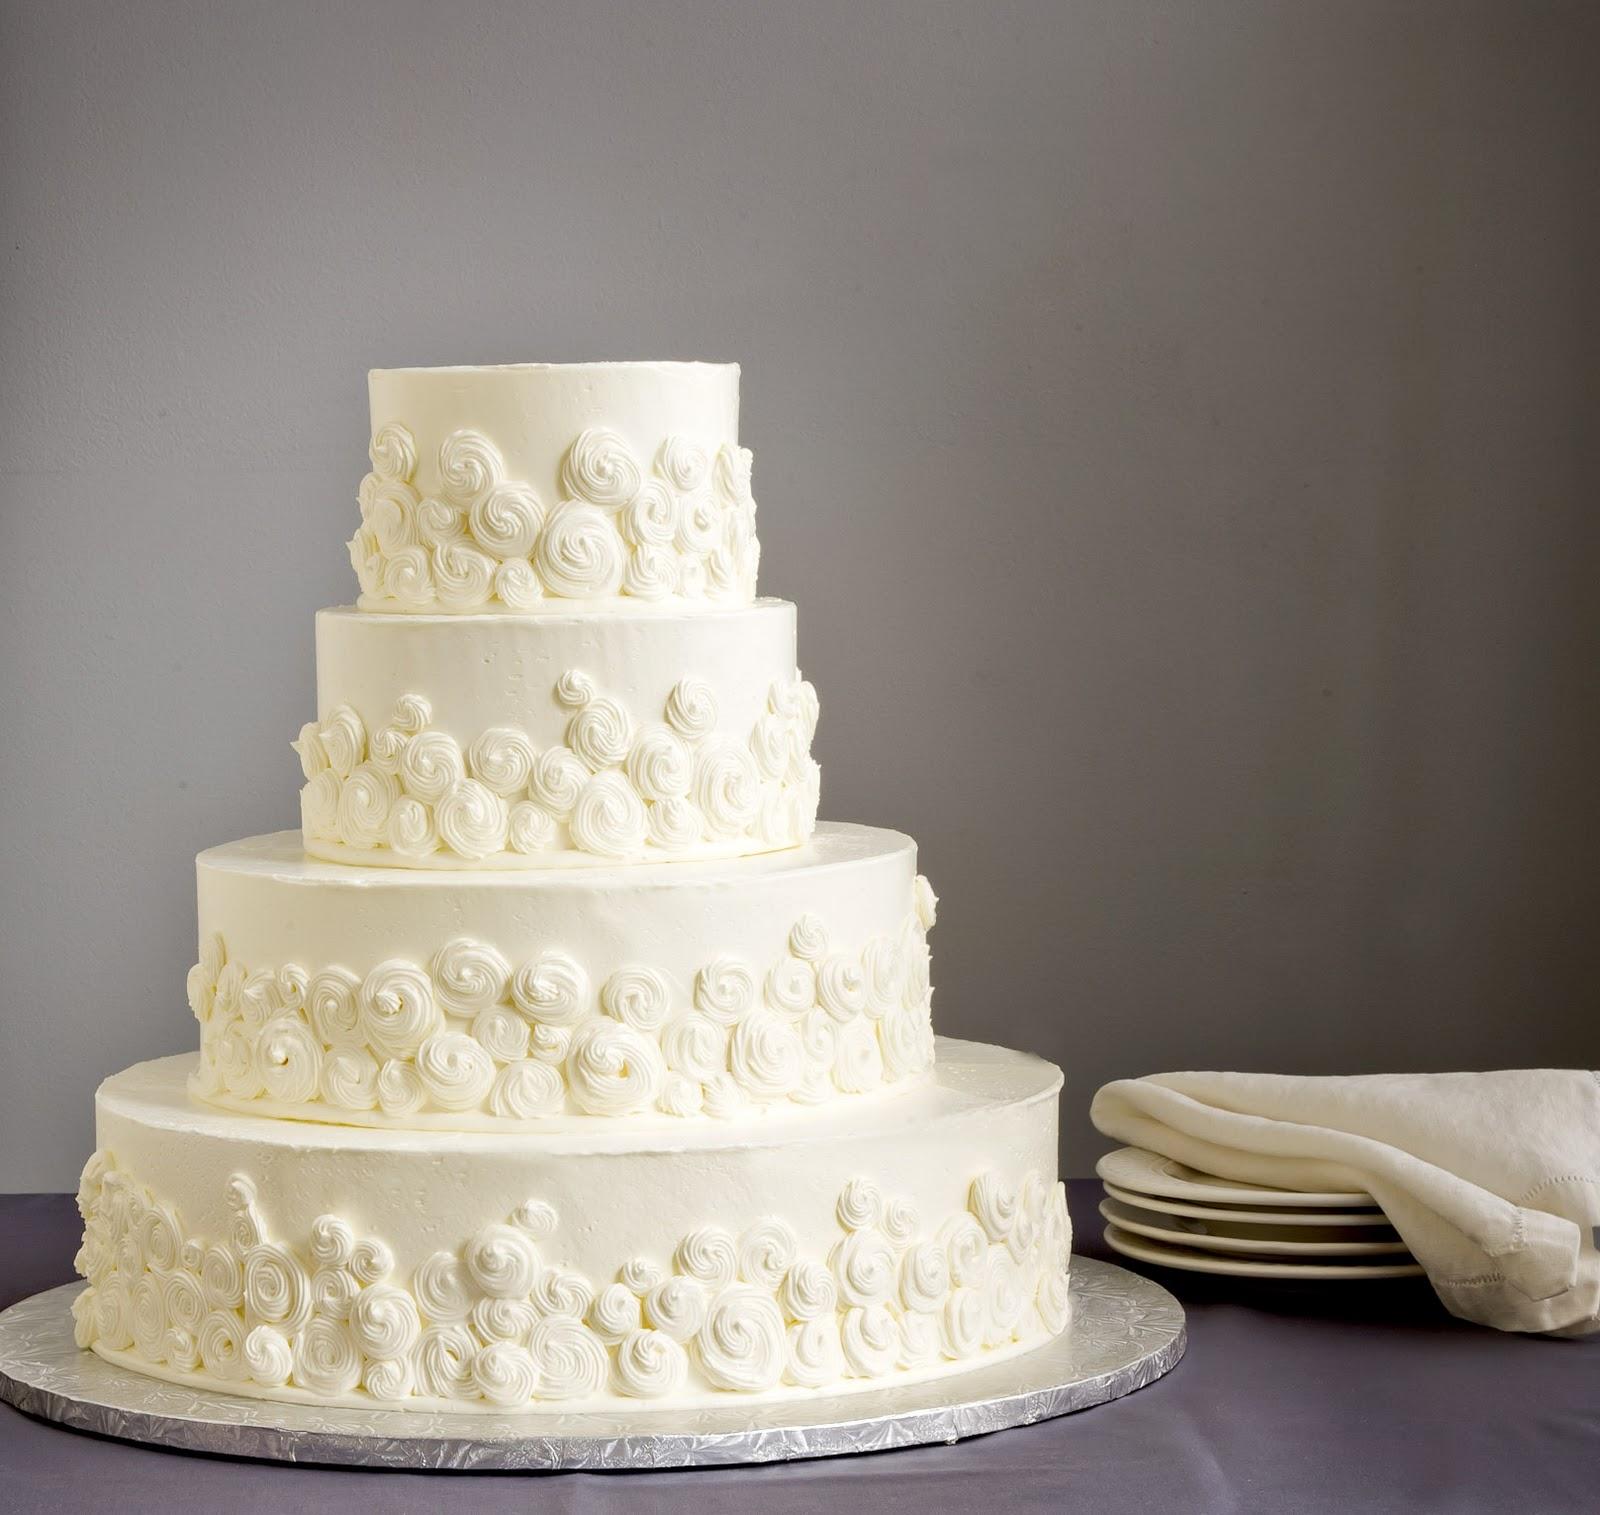 Three New Wedding Cake Ideas